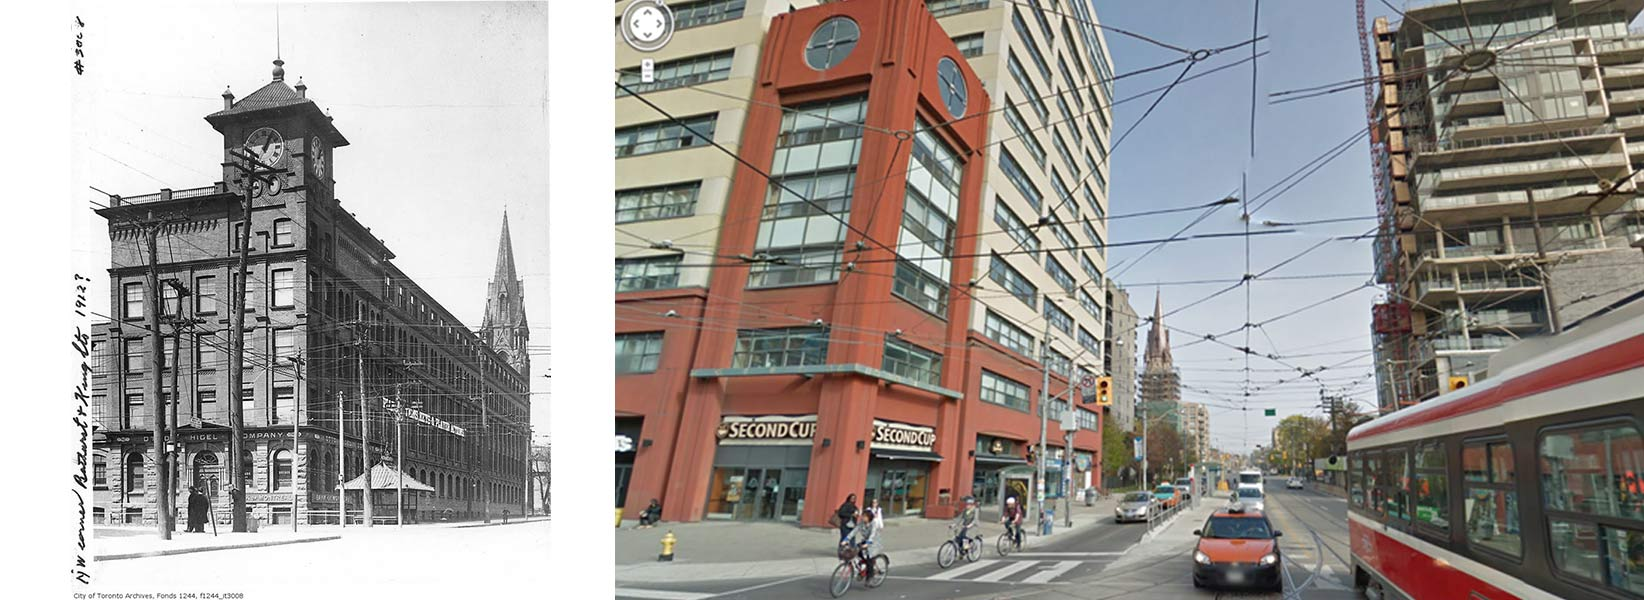 Bathurst Street and King Street Toronto  1912 vs 2013